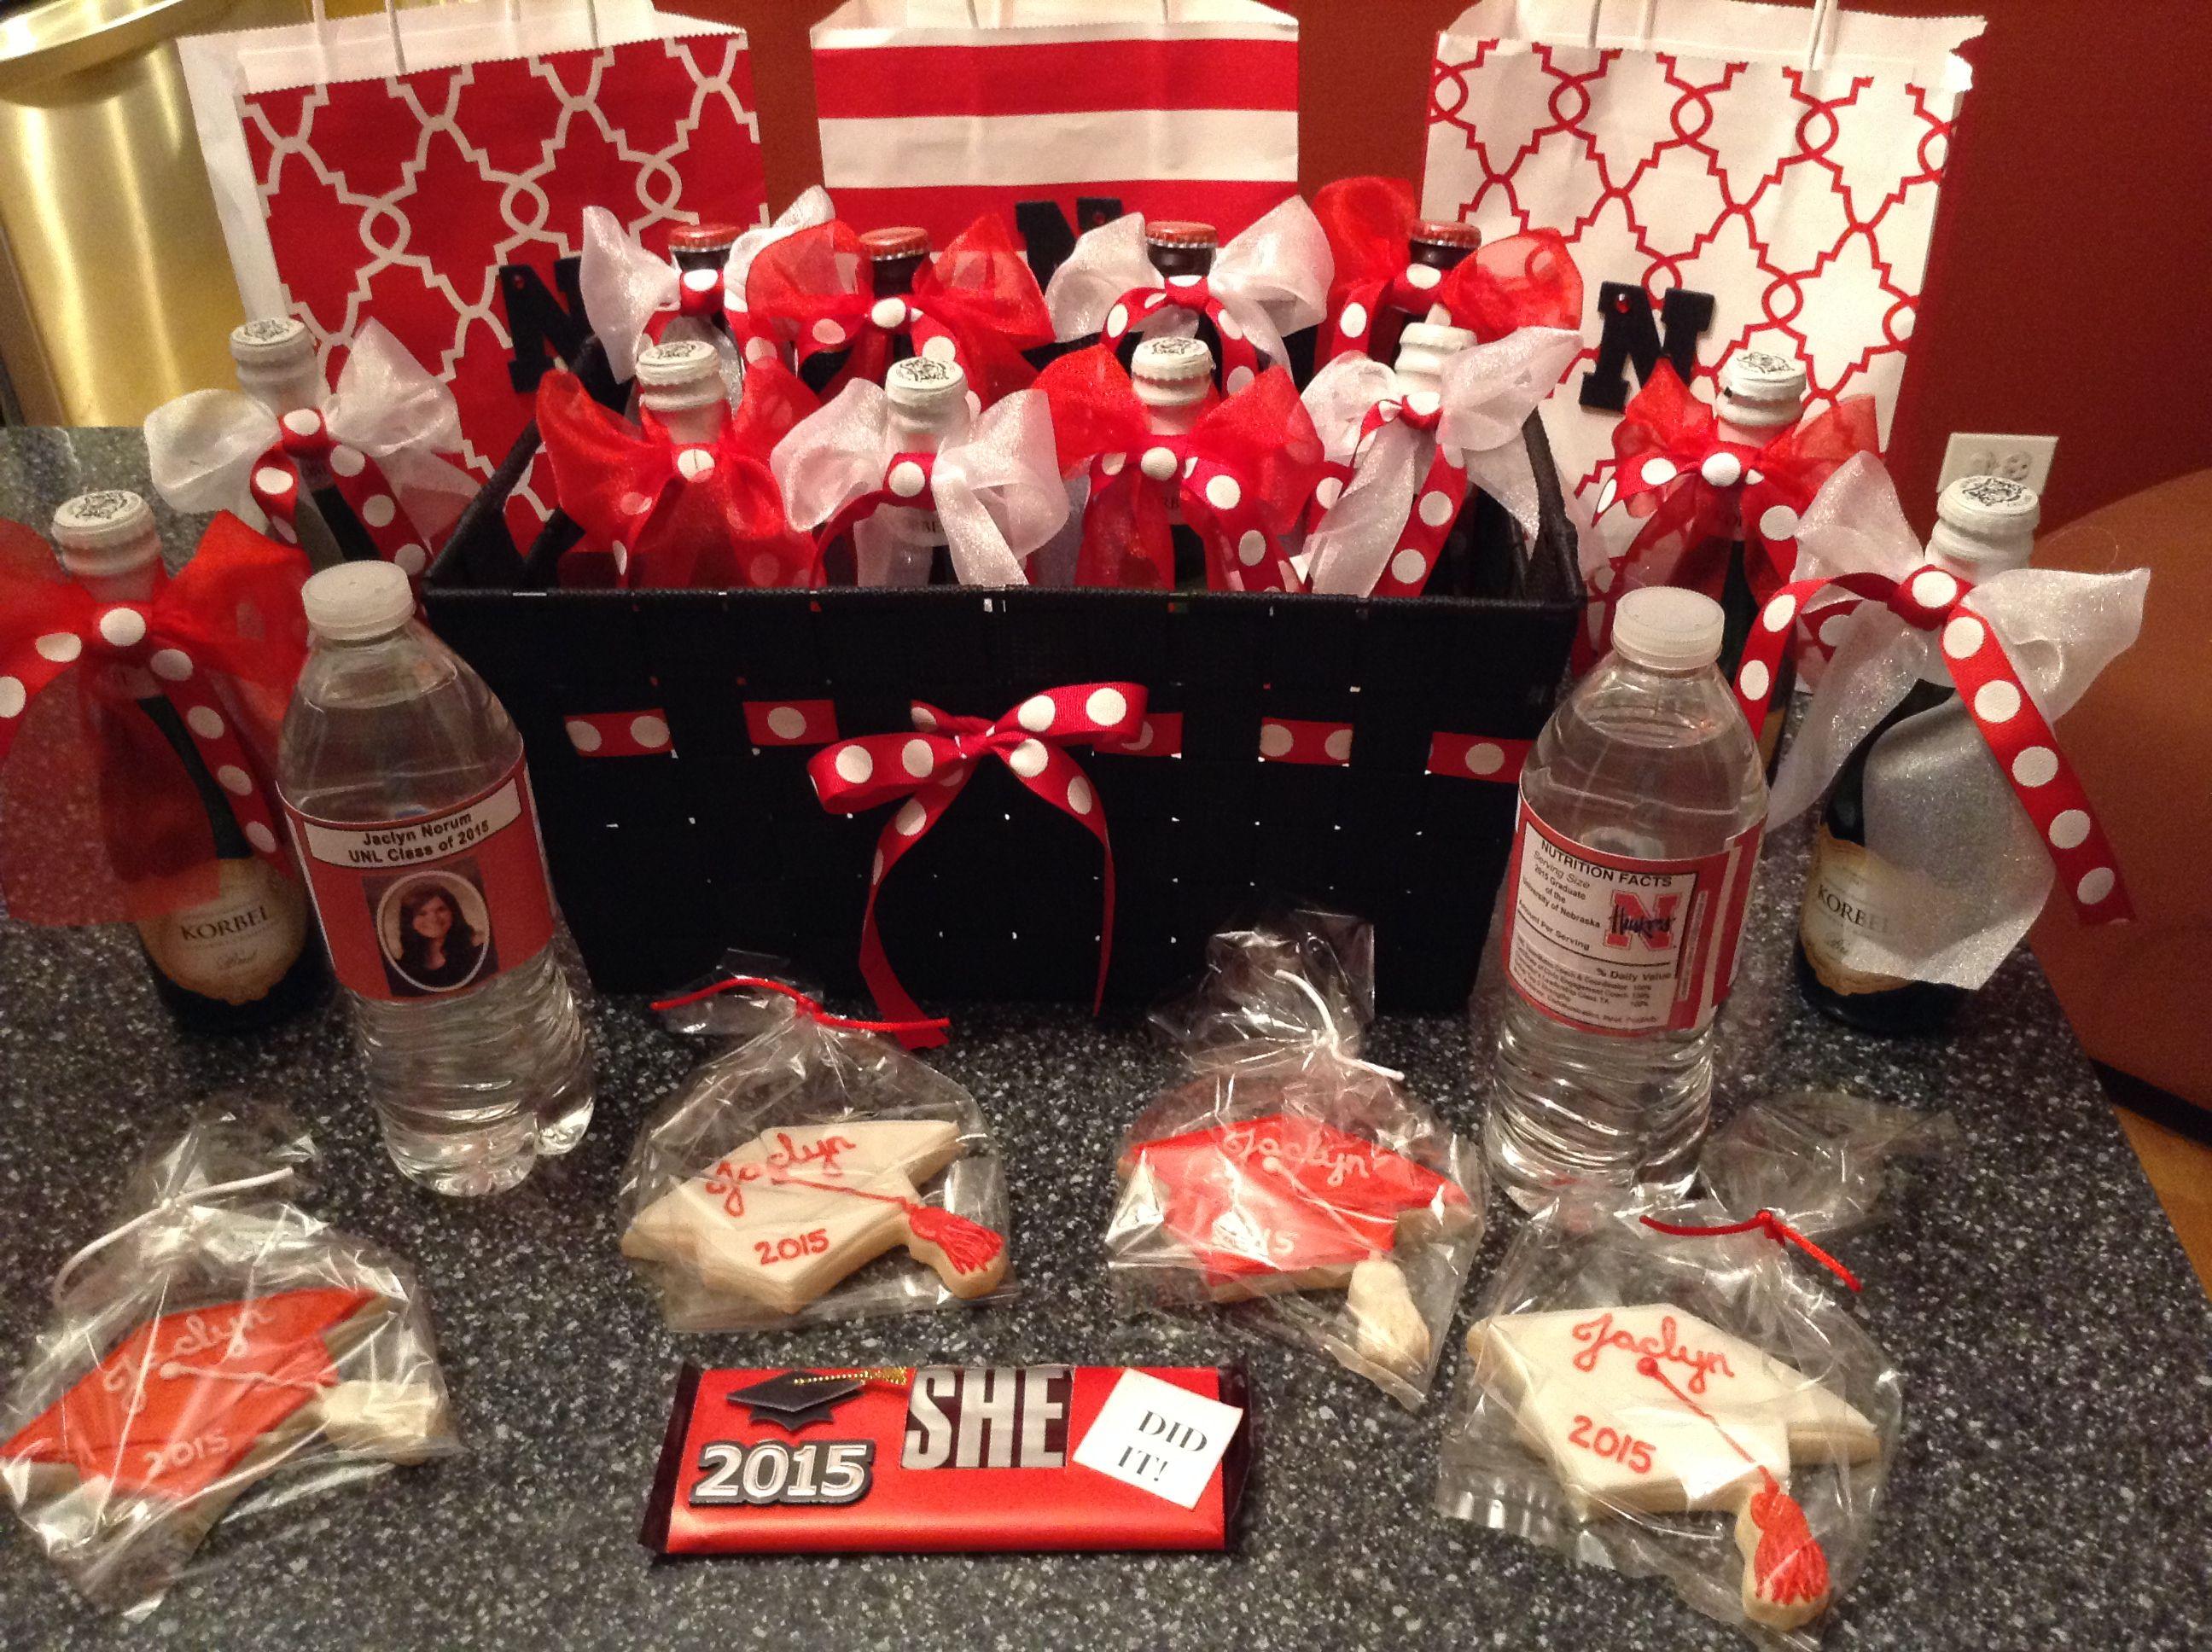 Graduation 2015minichampaign bottle basket with gift